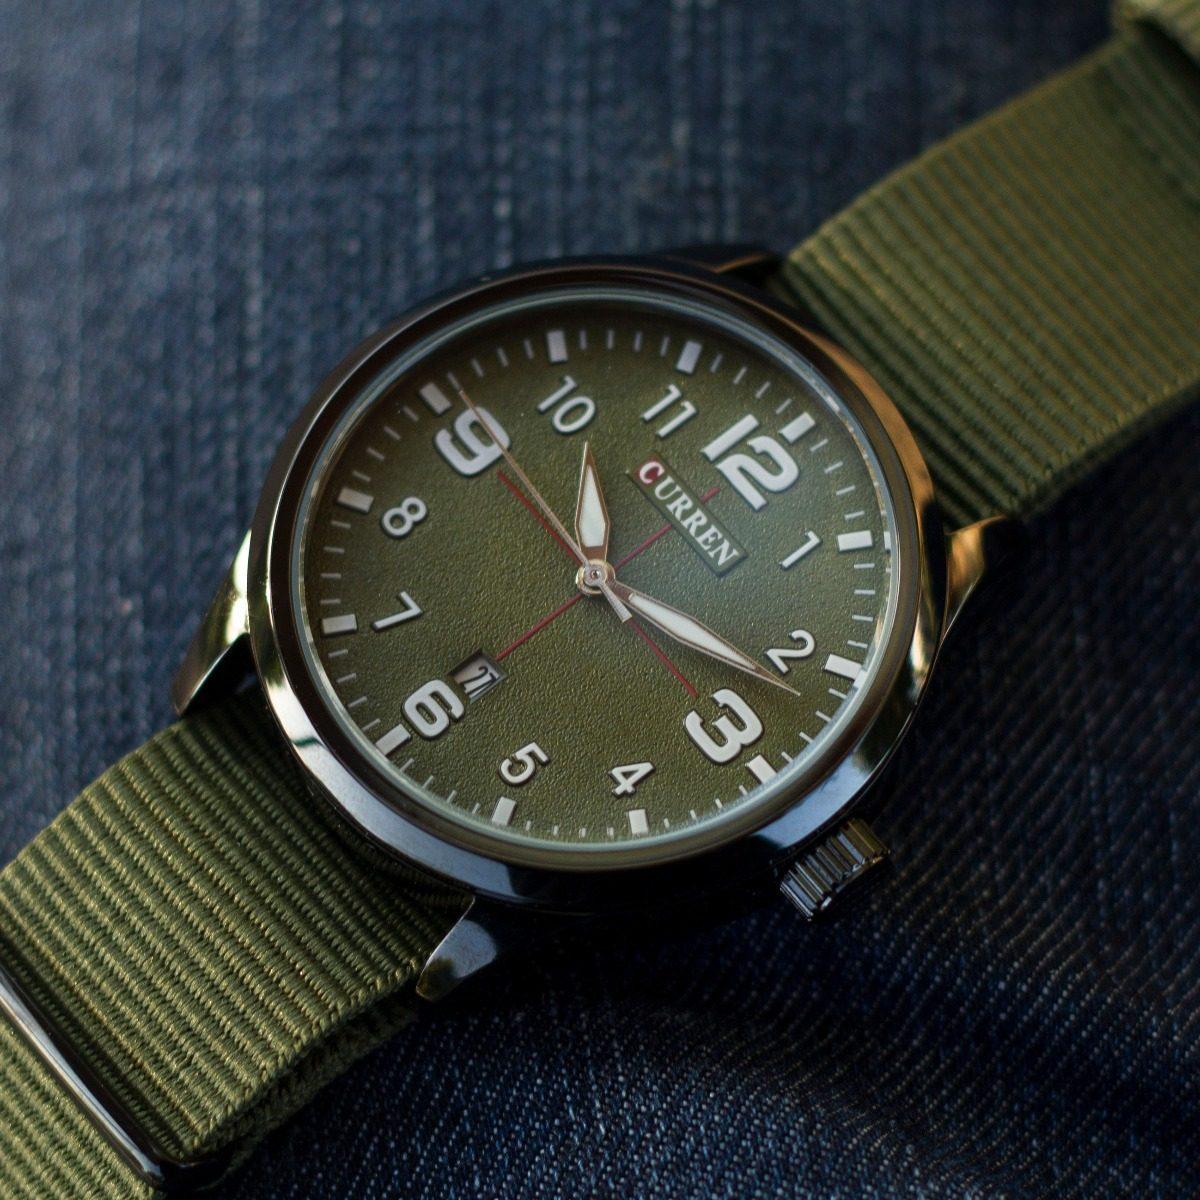 Verde Natos Militar Tela Reloj Curren Flieger Lona 2eDHEW9IY